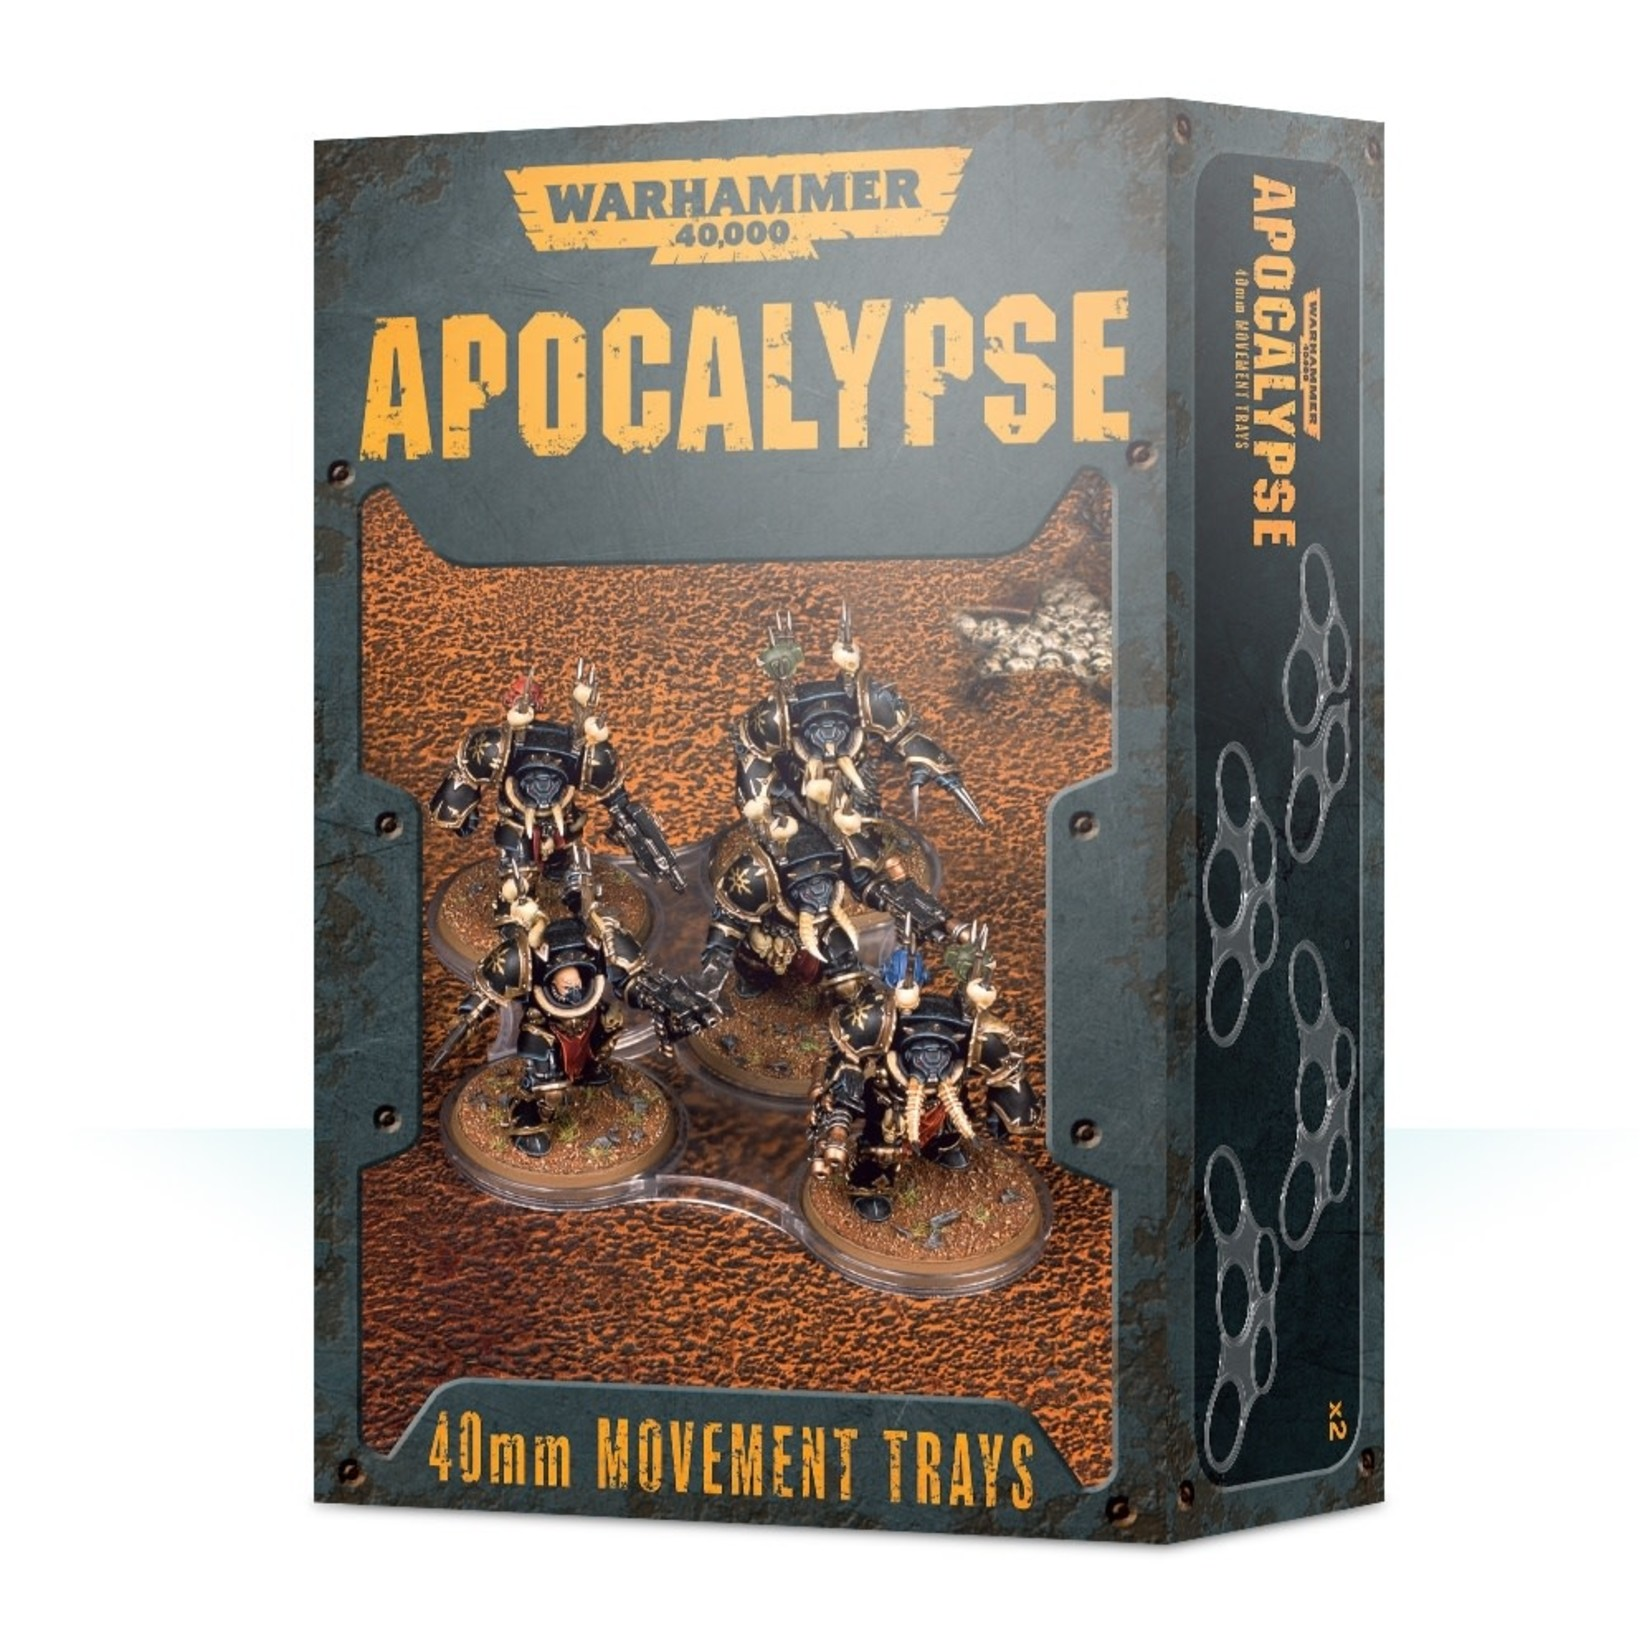 Games Workshop Apocalypse Movement Trays 40mm